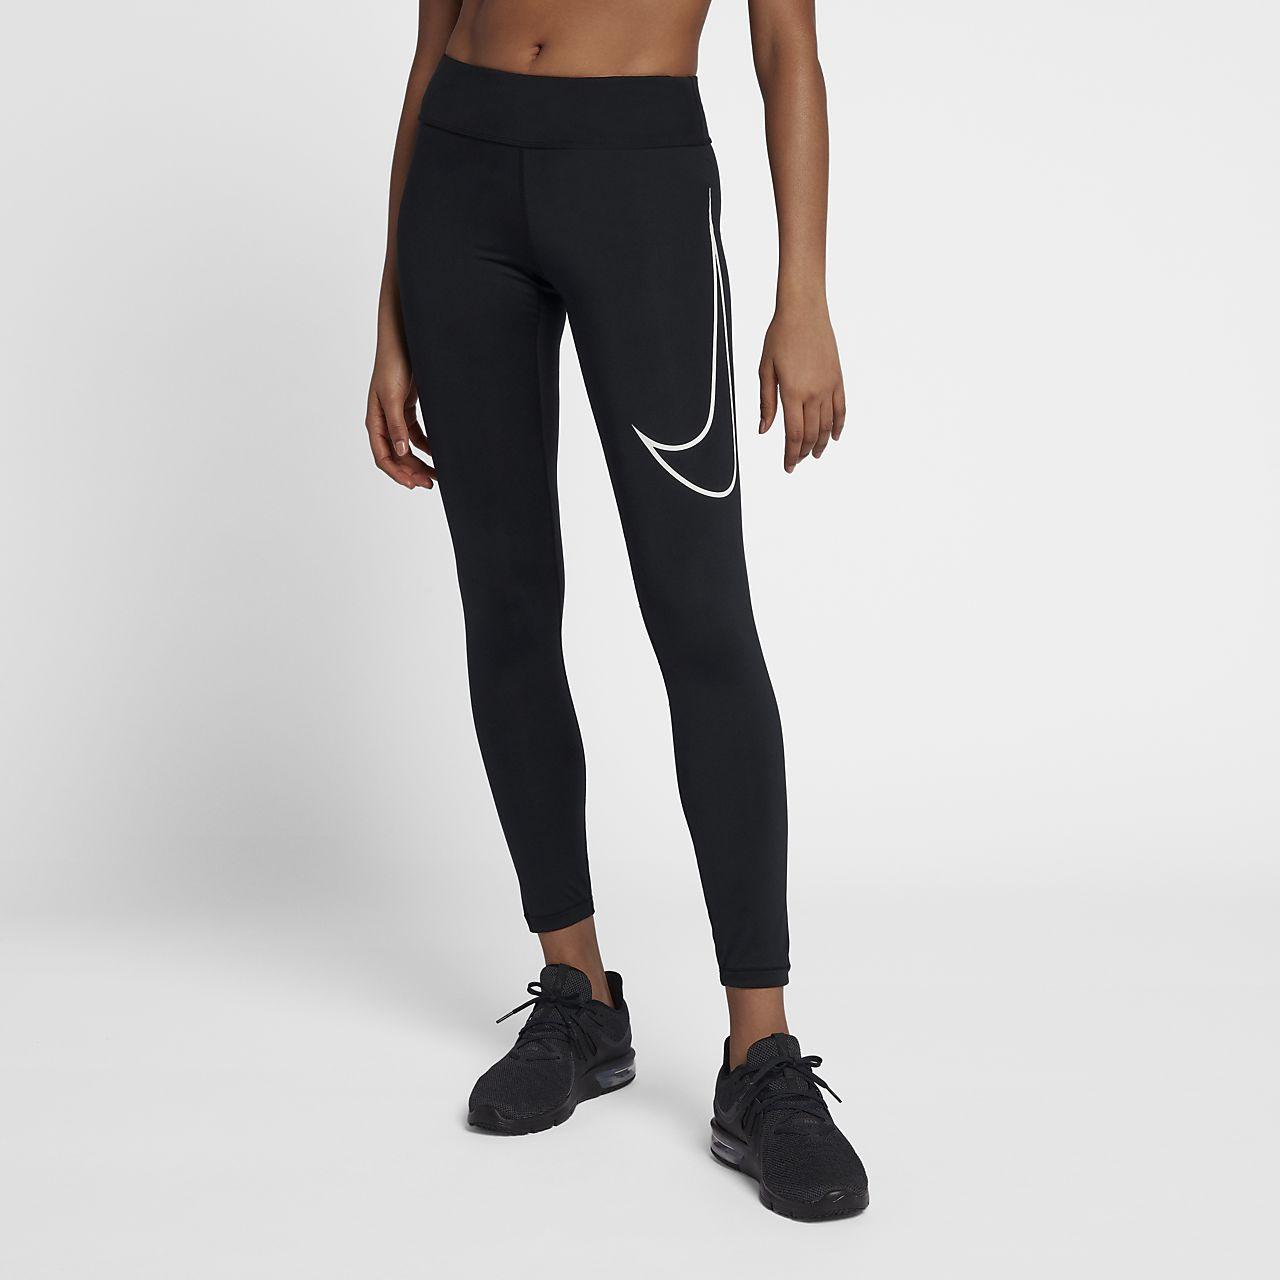 Nike Dri-Fit Essential Tights Sportswear for Women Shop Womens Sportswear COLOUR-black